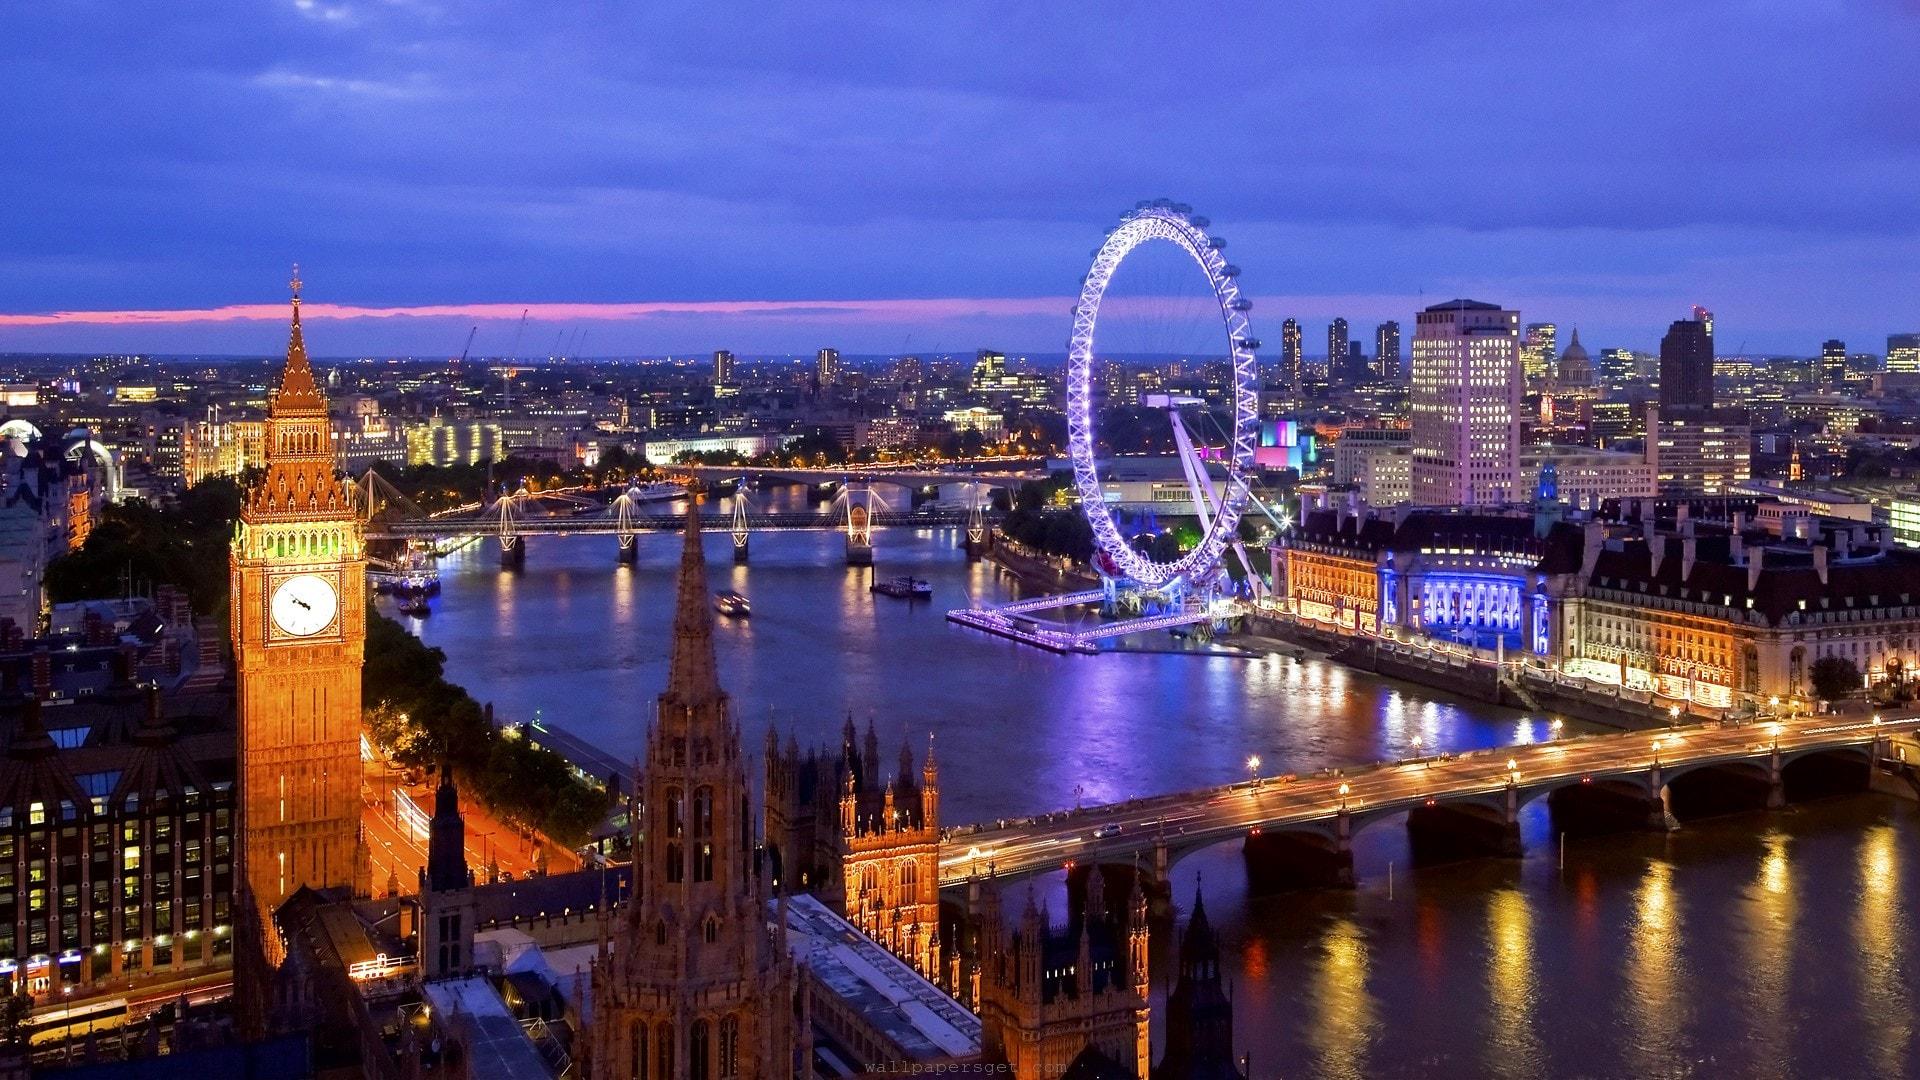 London Desktop wallpapers